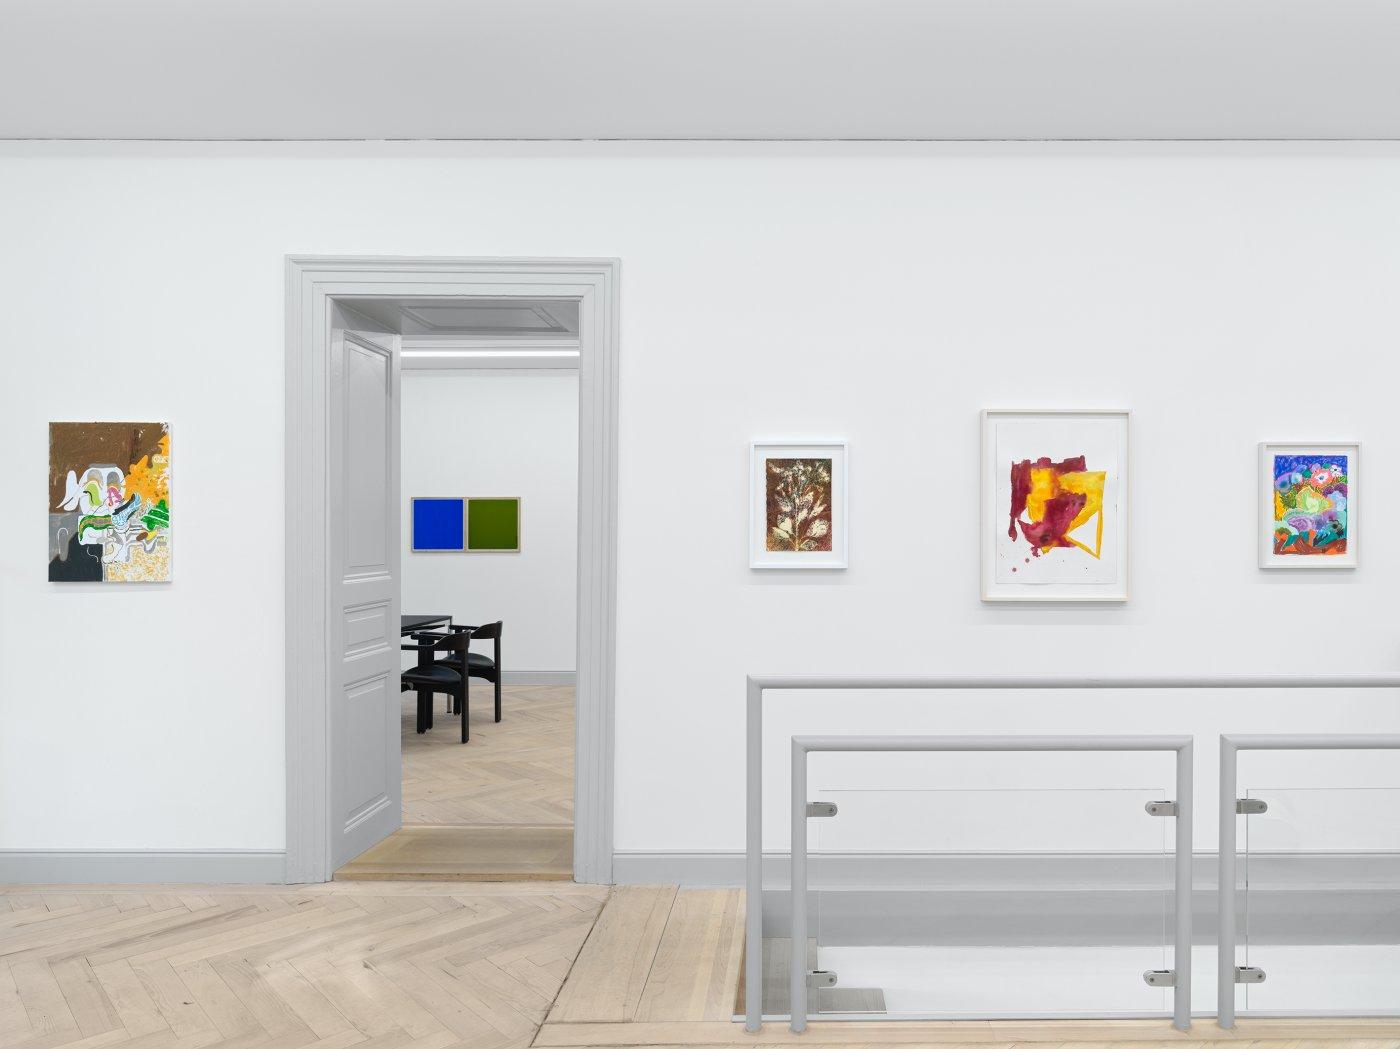 Galerie Eva Presenhuber All in One 5